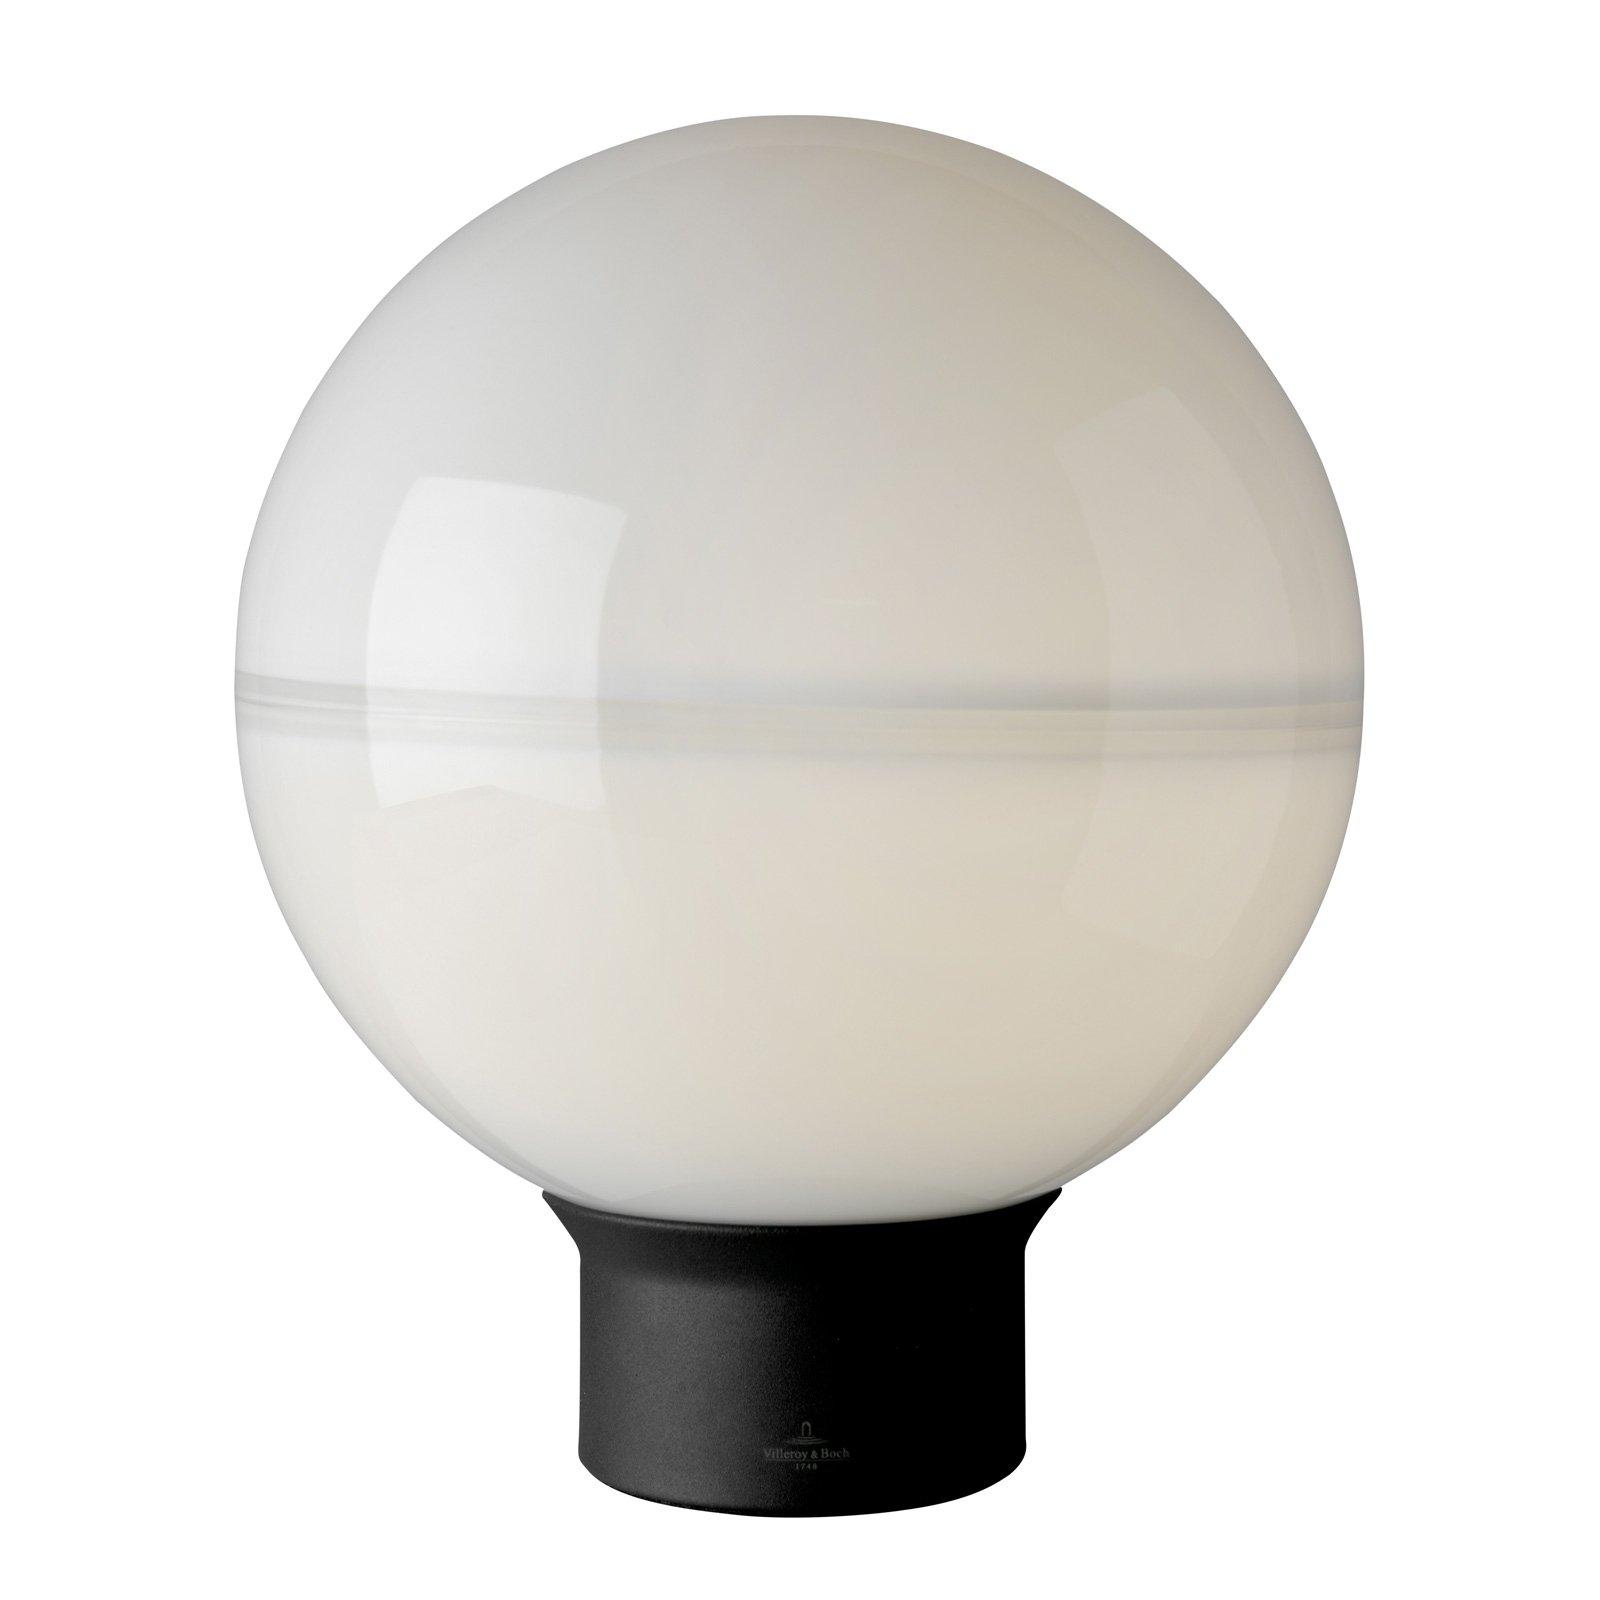 Villeroy & Boch Tokio bordlampe svart-hvit 30 cm